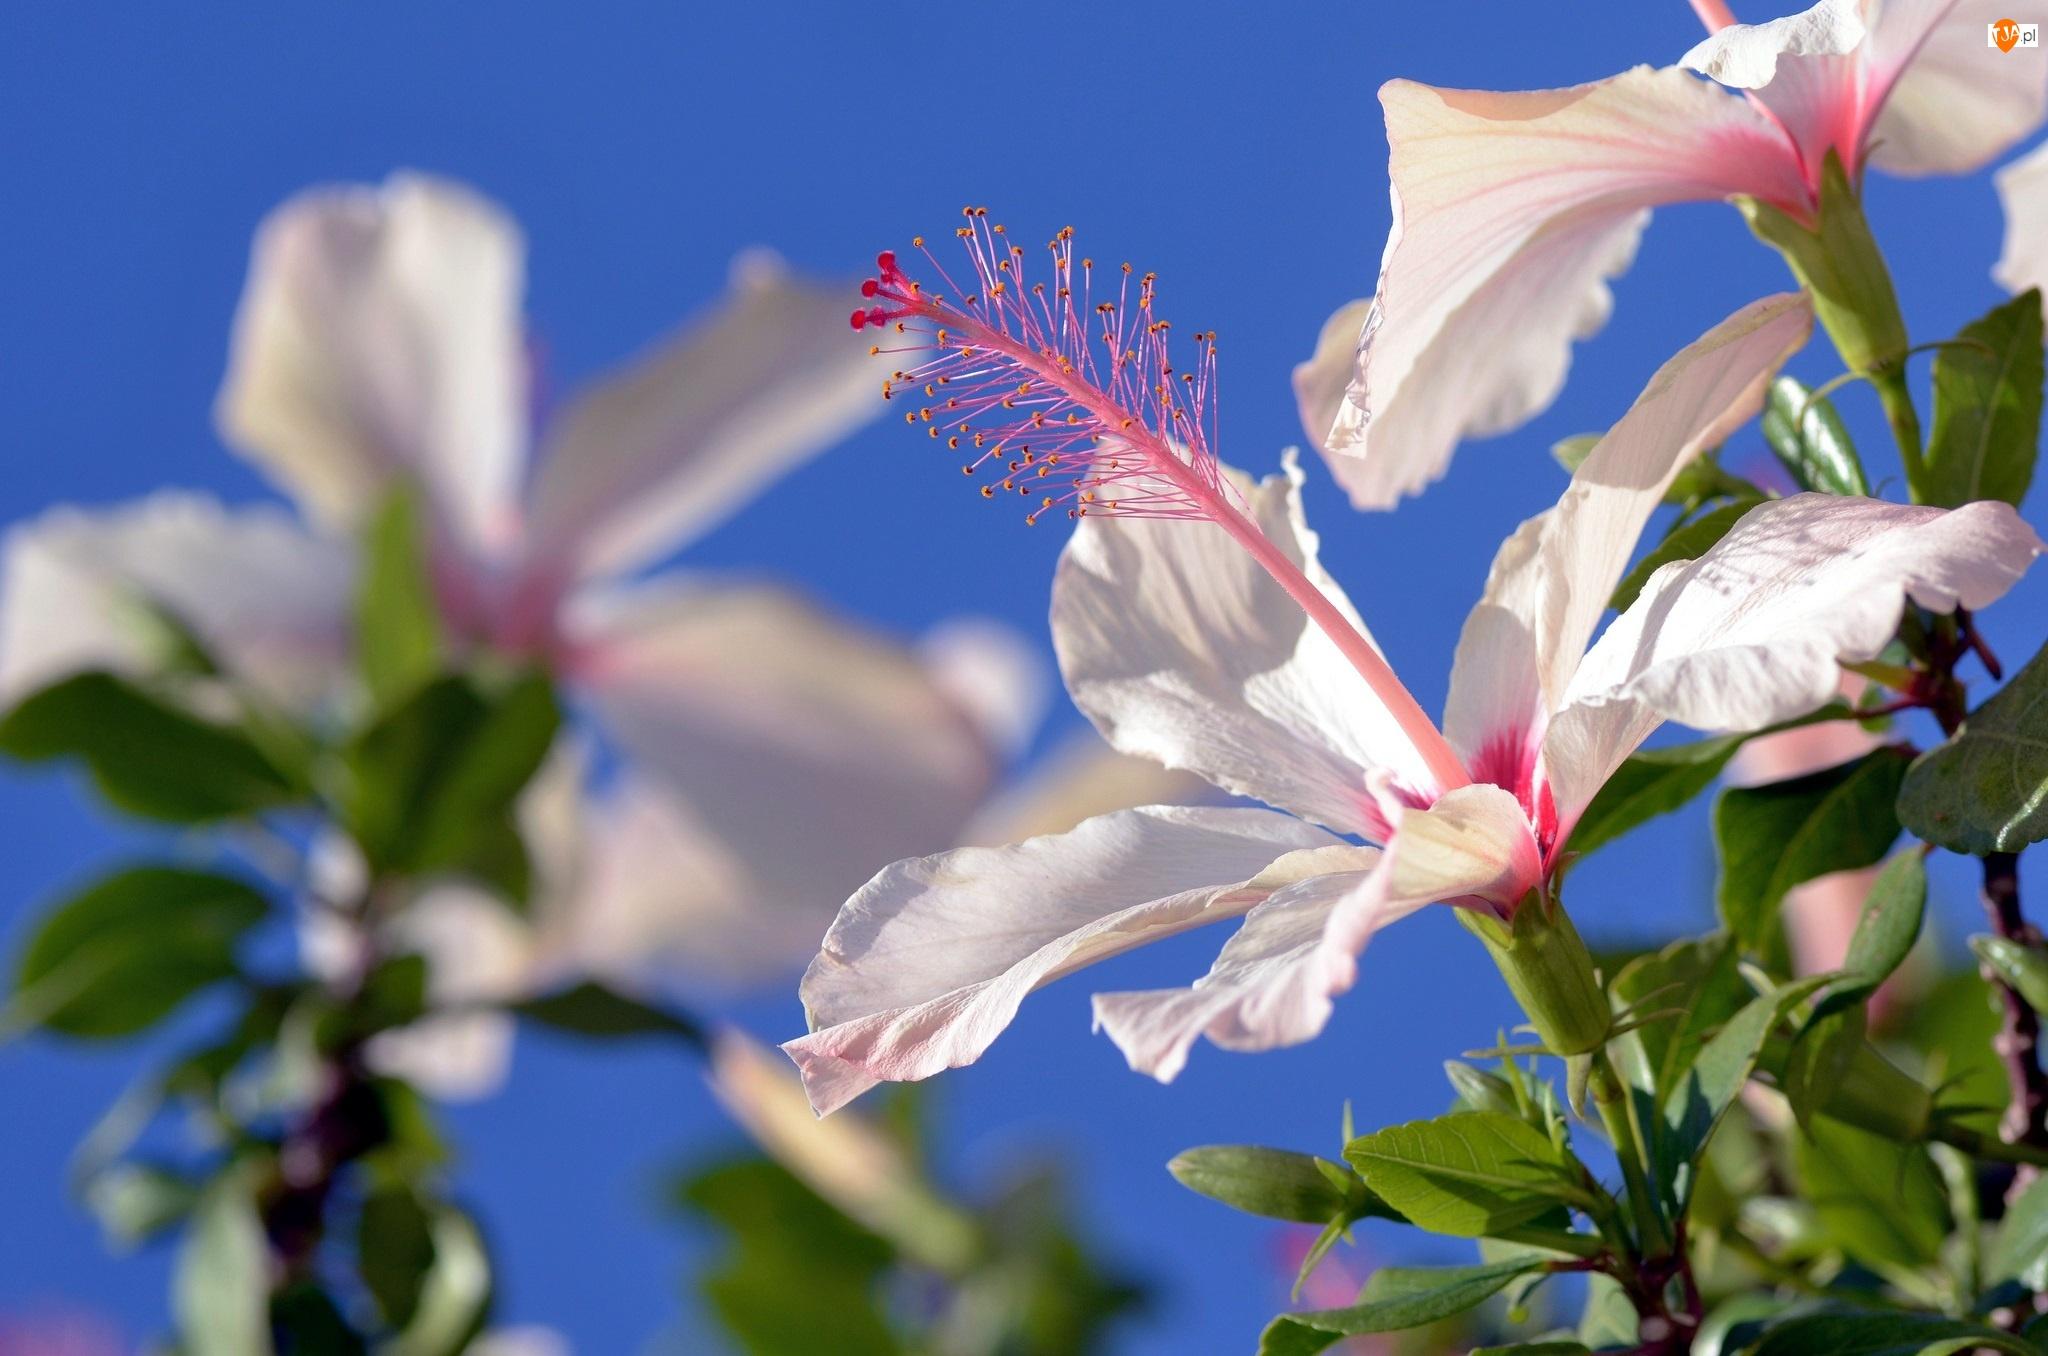 Kwiat, Lato, Biały Hibiskus, Niebo